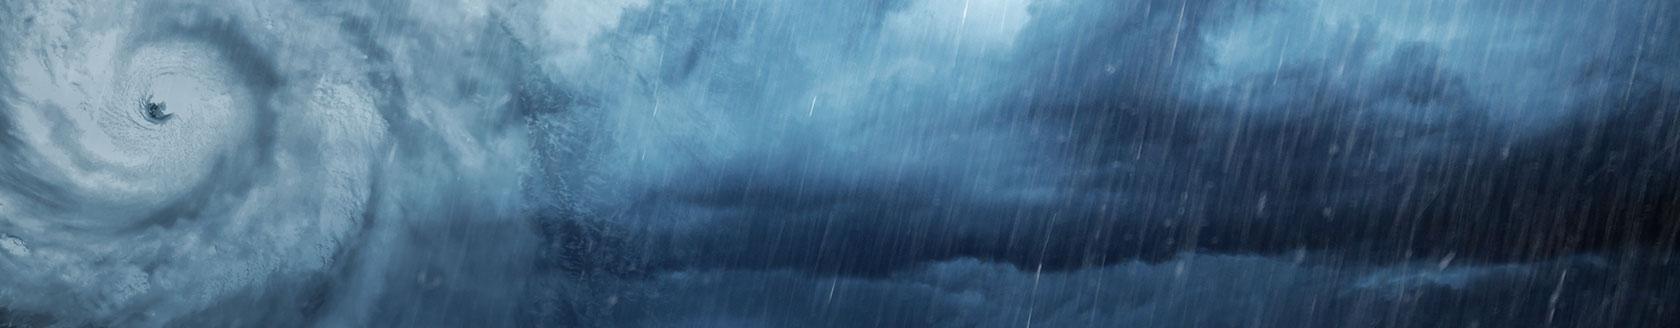 Everything you need to prepare for hurricane season